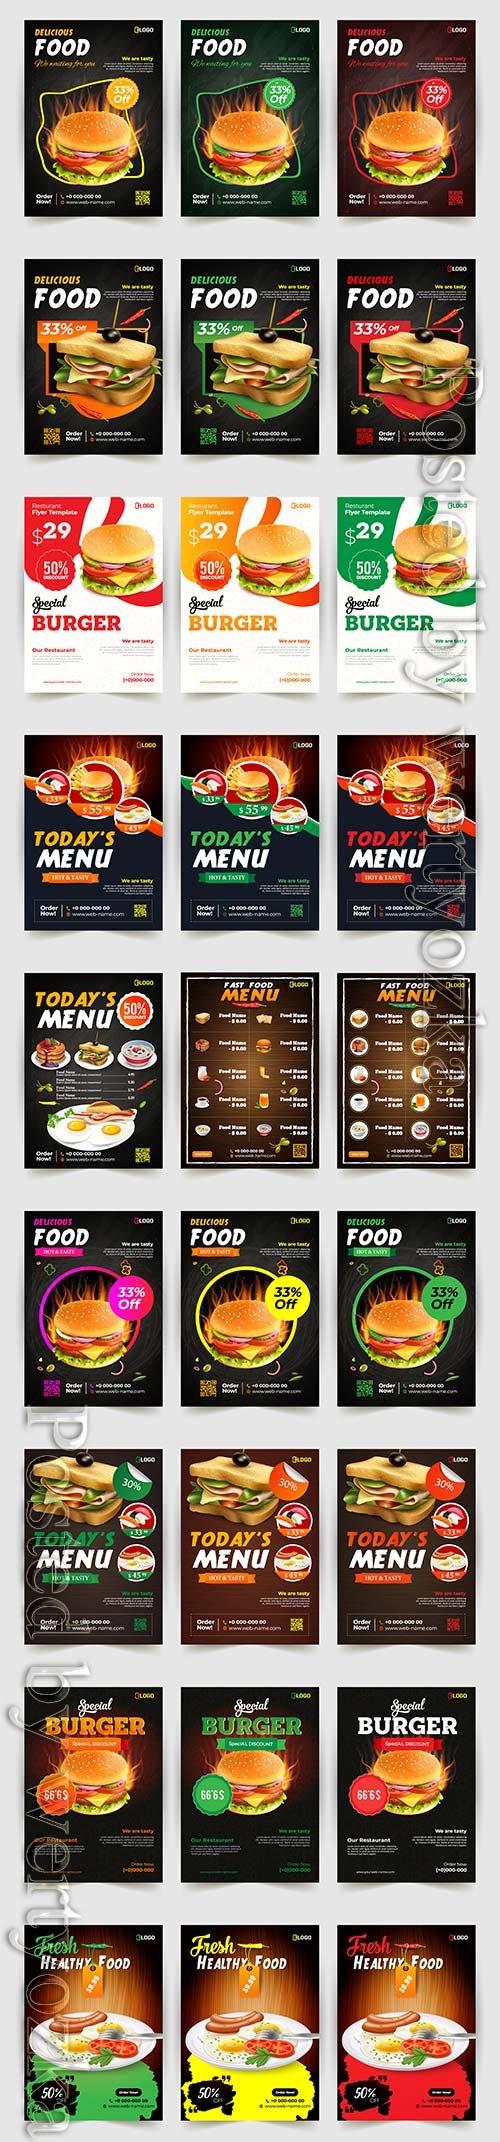 Fast food flyer design vector template, brochure flat design